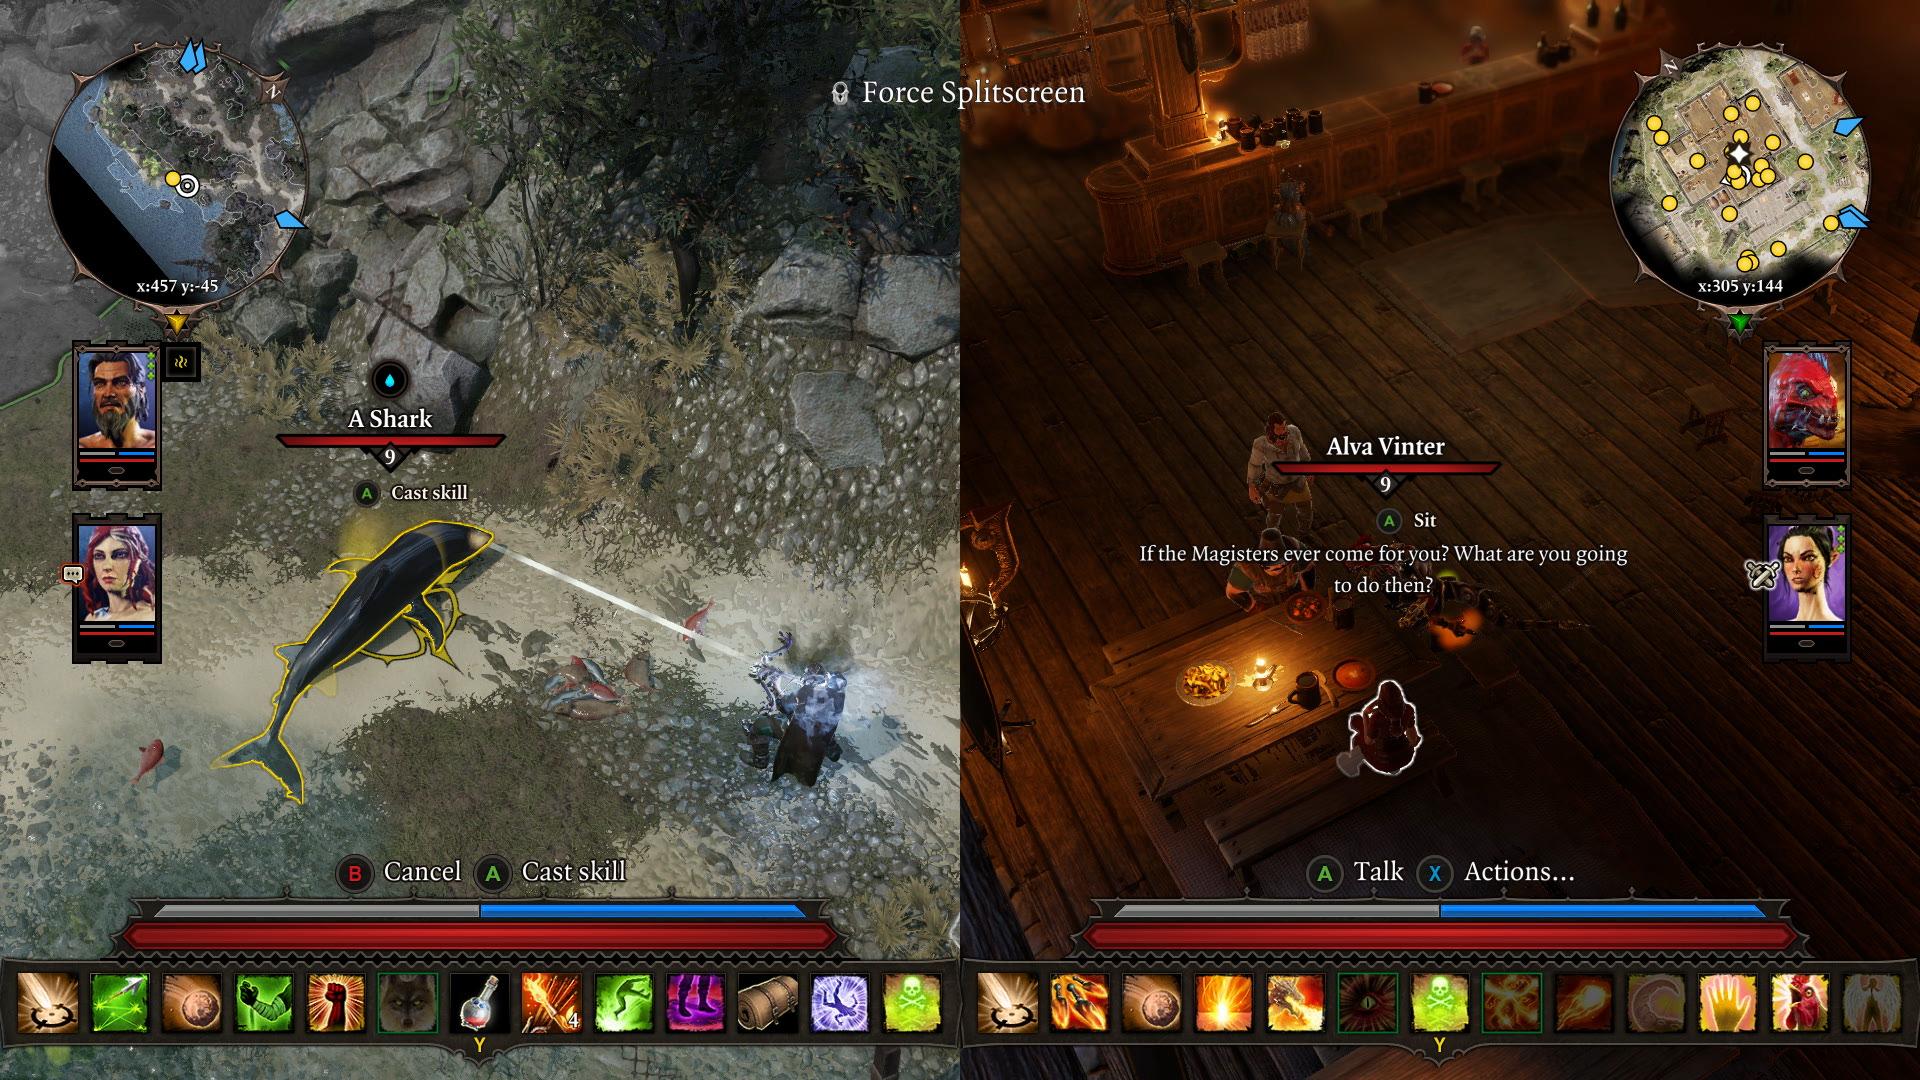 Split screen screenshot showing 2 people playing co-op in Divinity 2